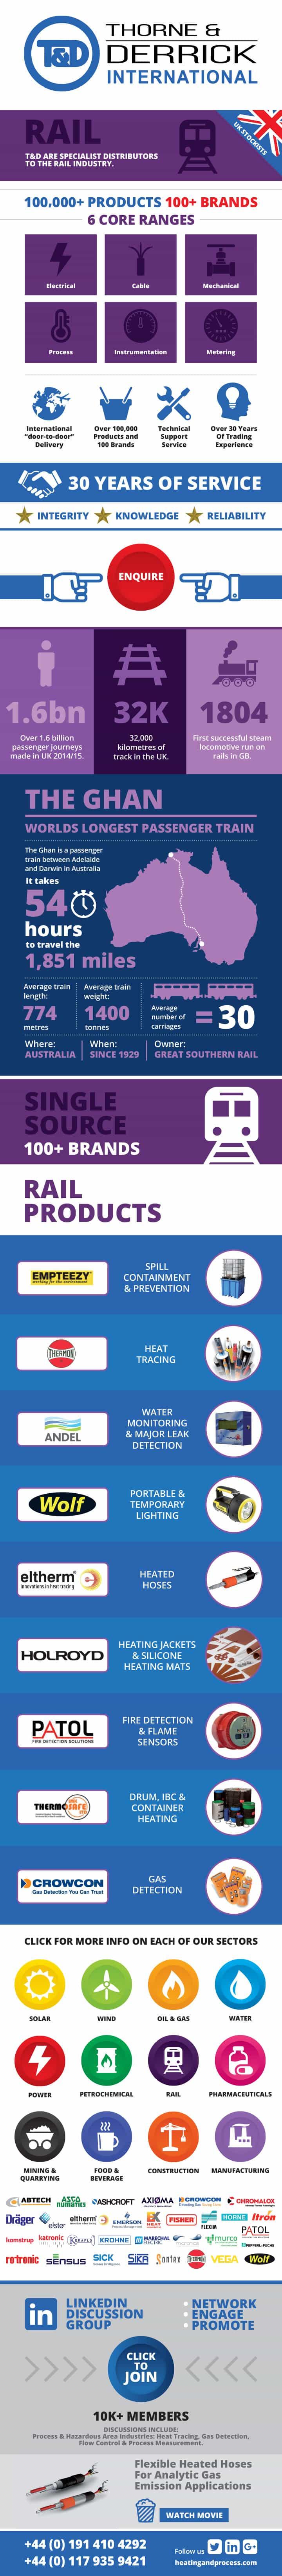 Rail Infographic